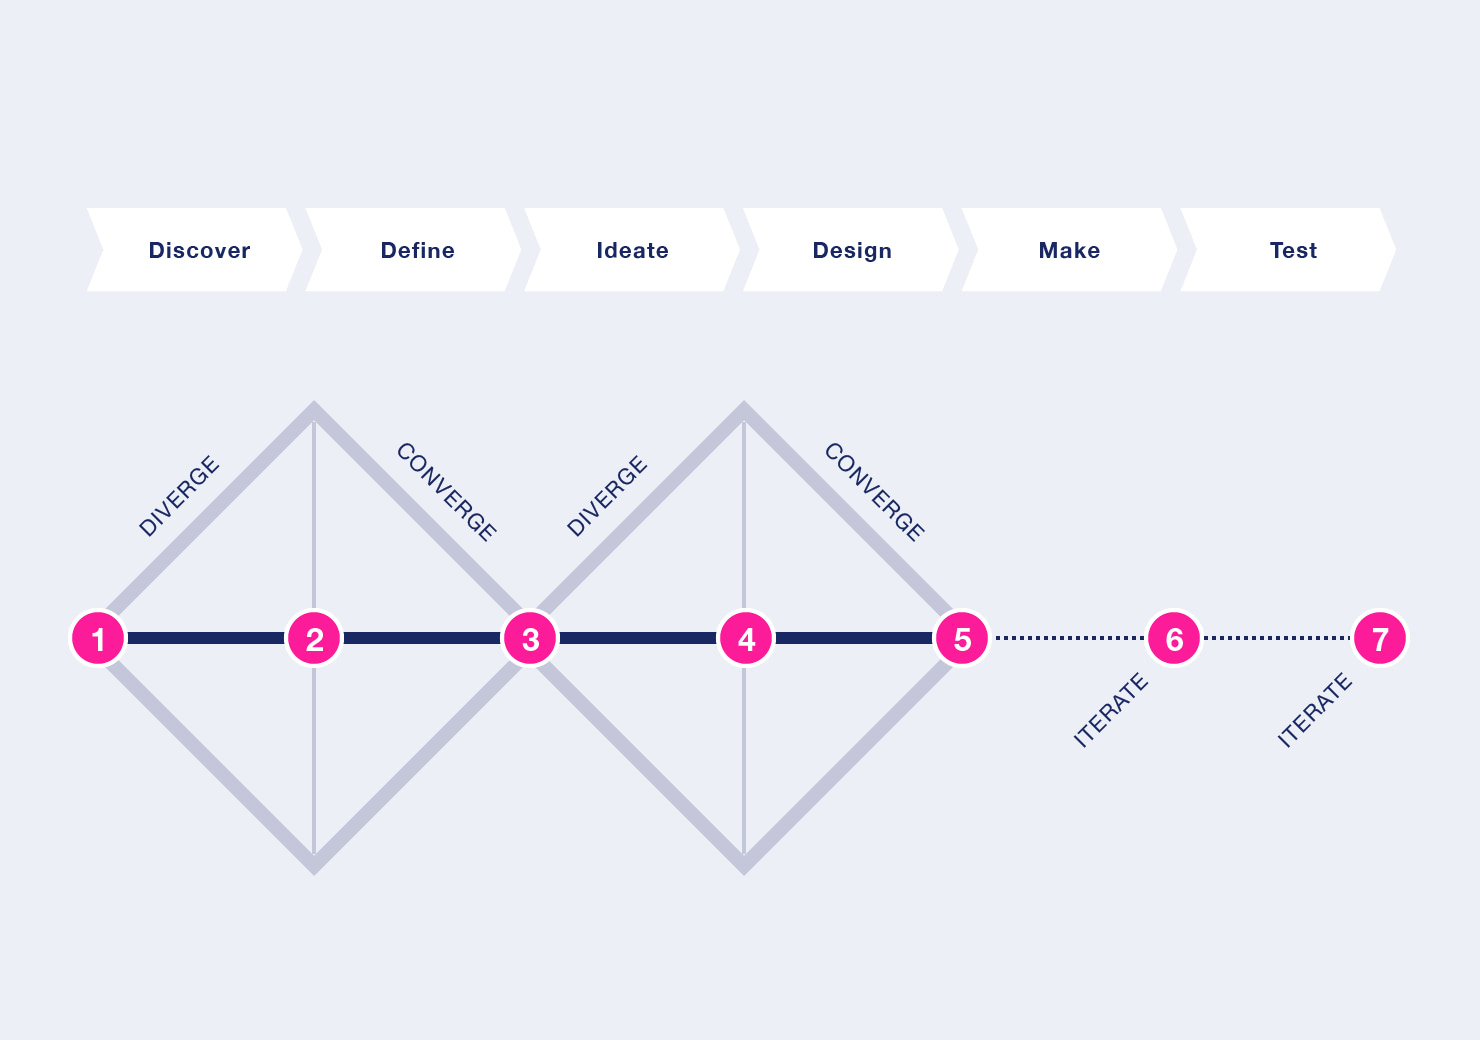 Usercentered Design Process slide 6